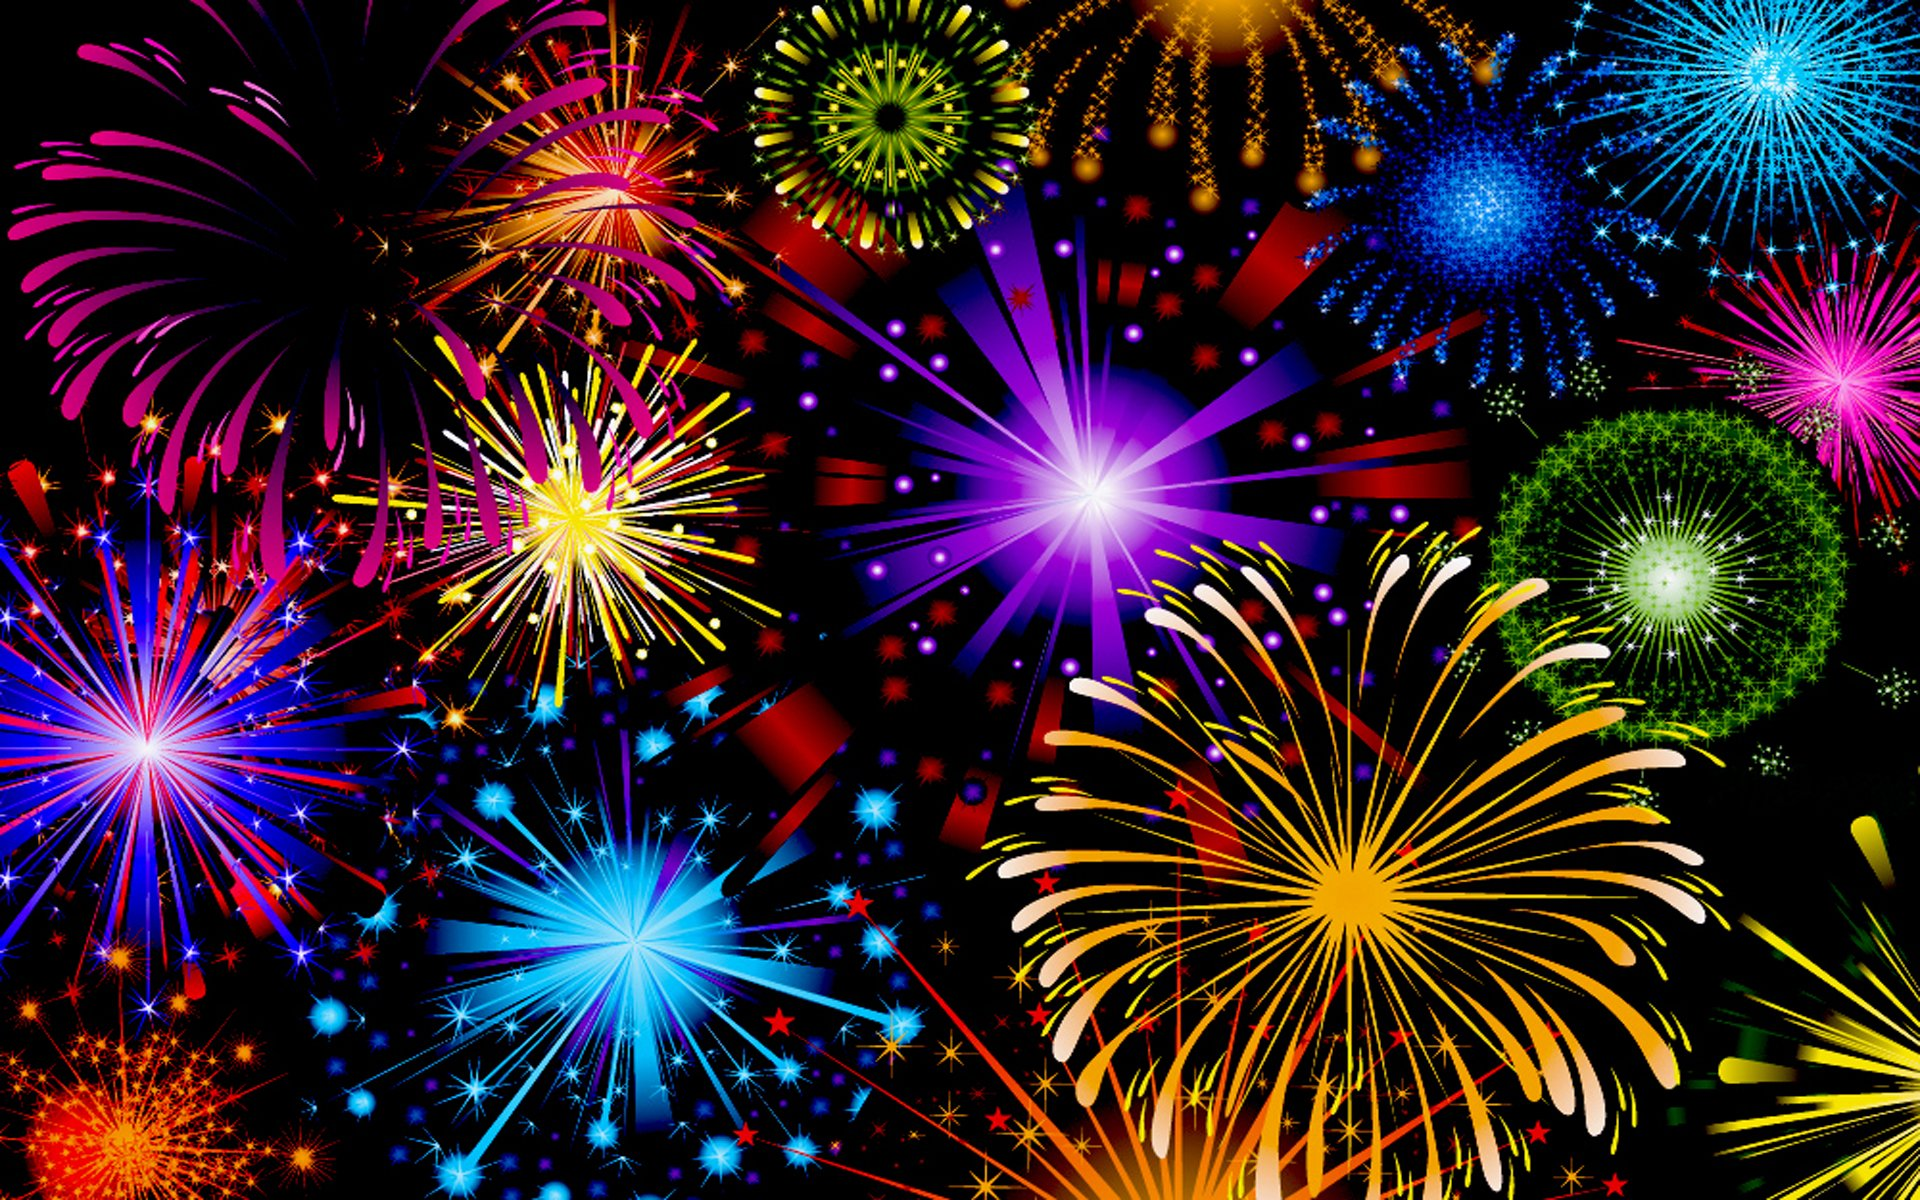 Fireworks Wallpaper Free: Colorful Fireworks HD Wallpaper